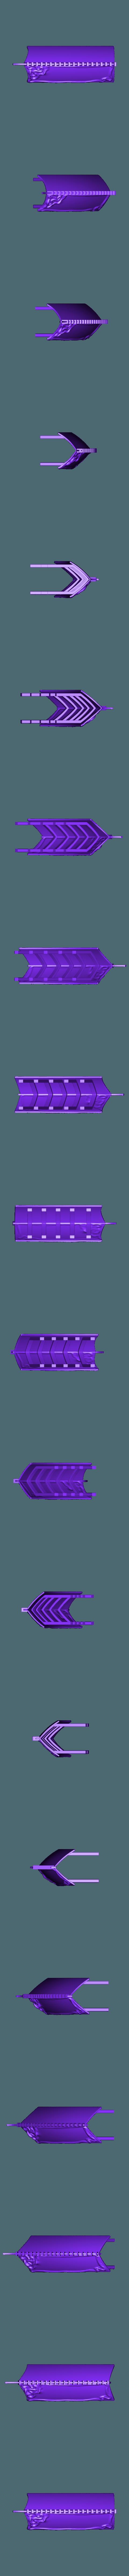 3%E8%B5%B0%E5%BB%8A266443.stl Download free STL file Guanghan Palace  Change Fairy • 3D printable design, stronghero3d